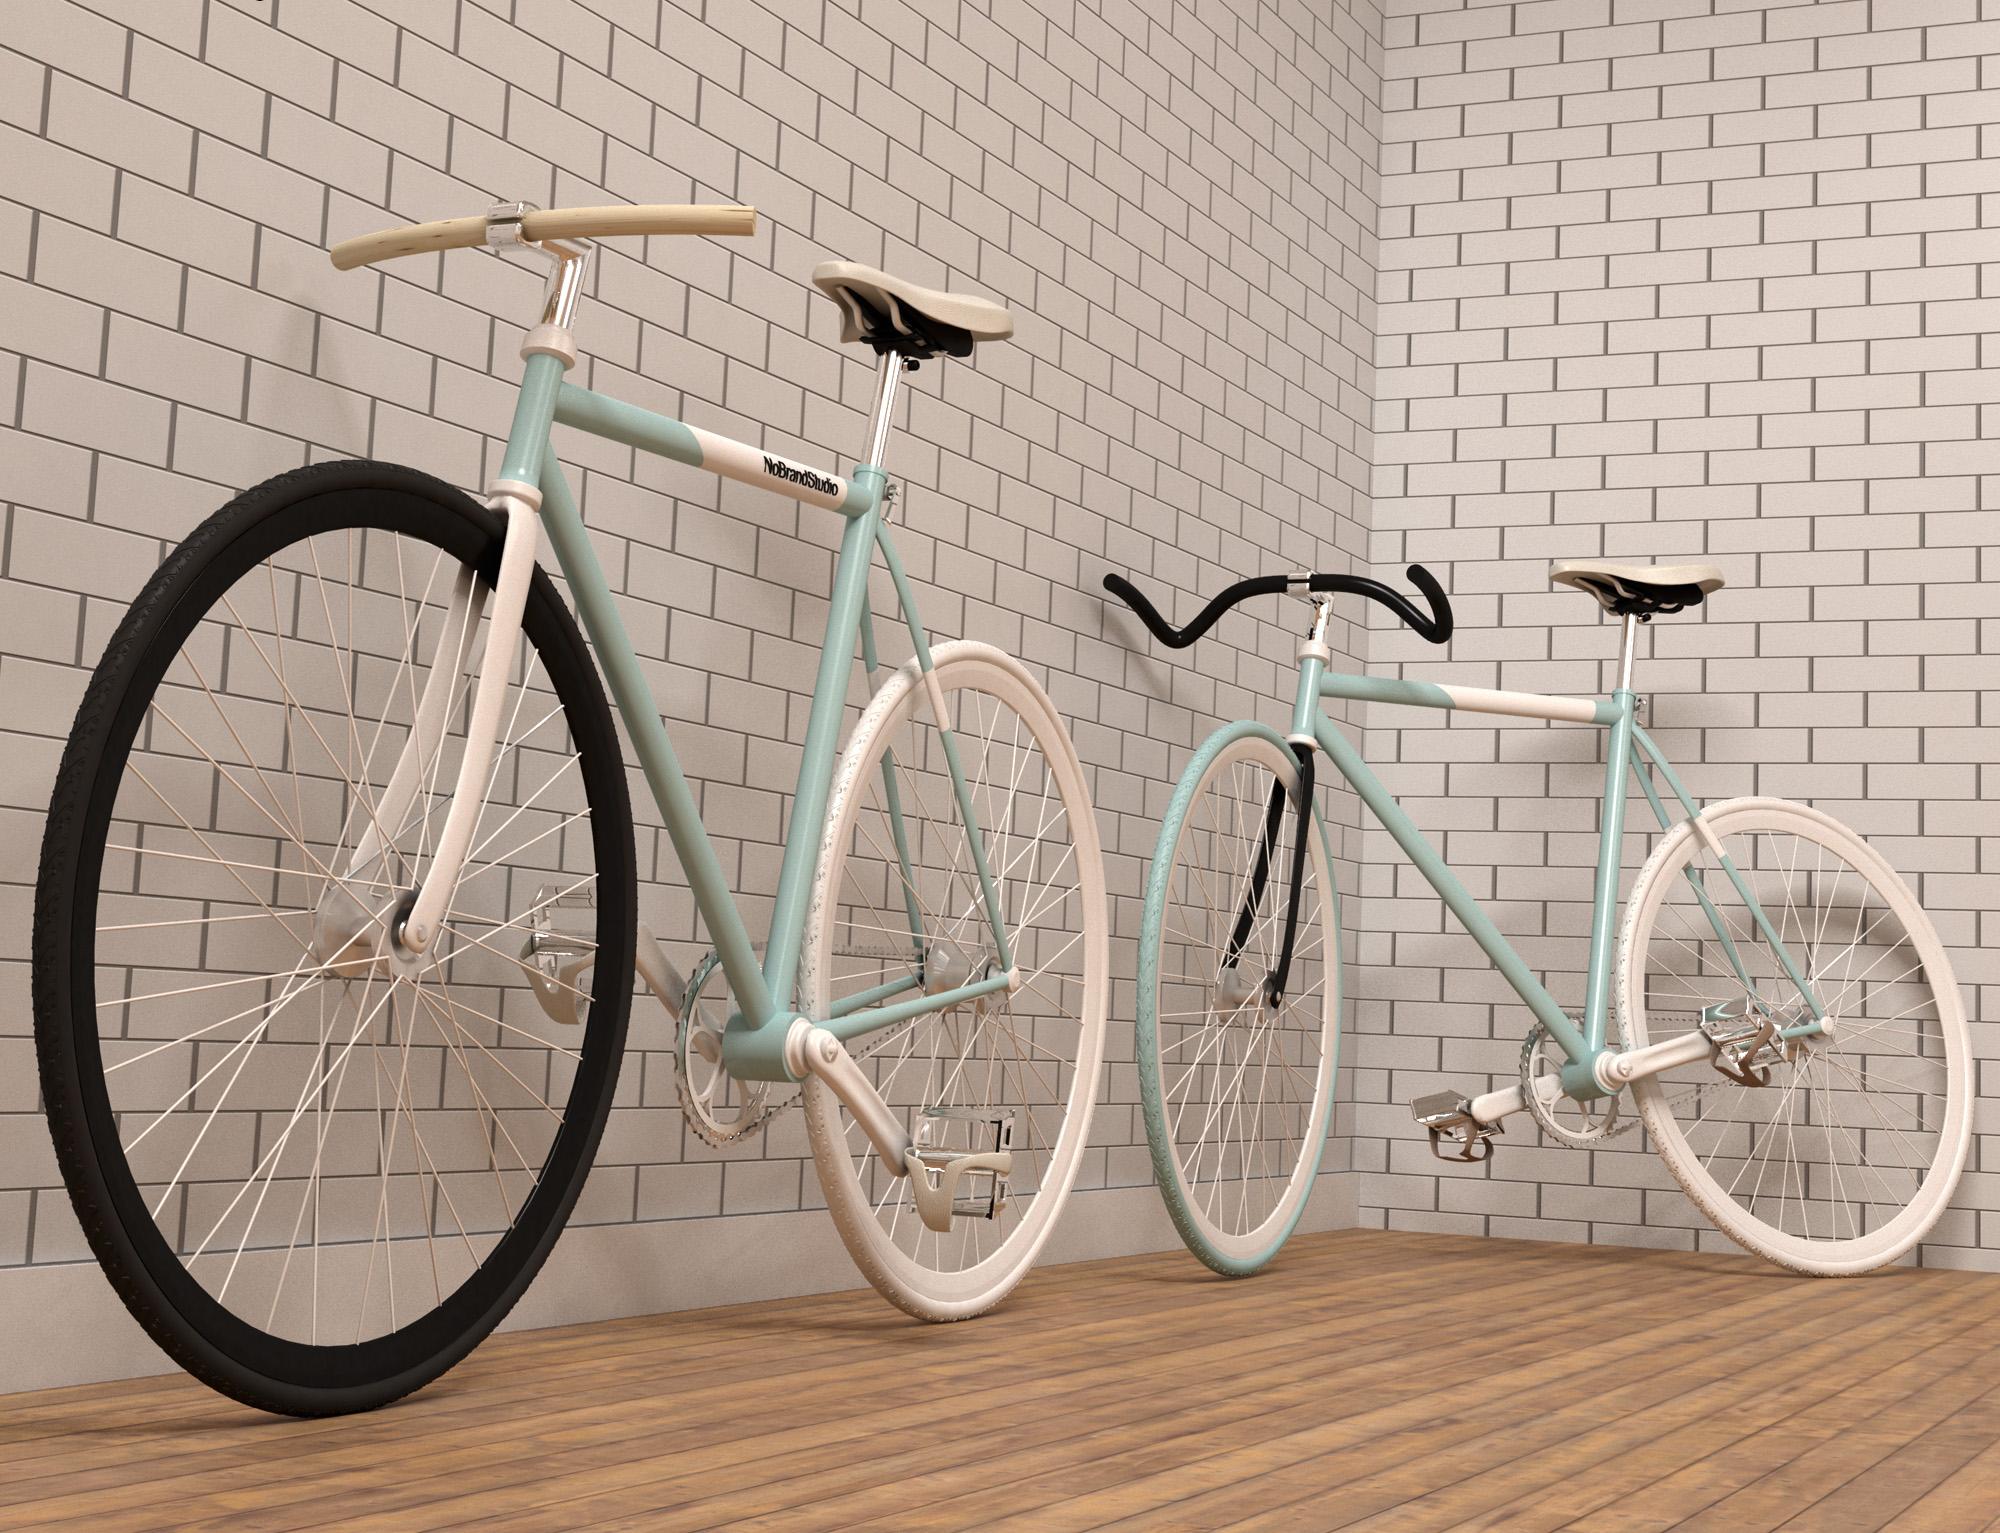 555355b16 00 Vintage Bikes 3D Preview Image.jpg 01 Vintage Bikes Presentation 01.jpg  ...